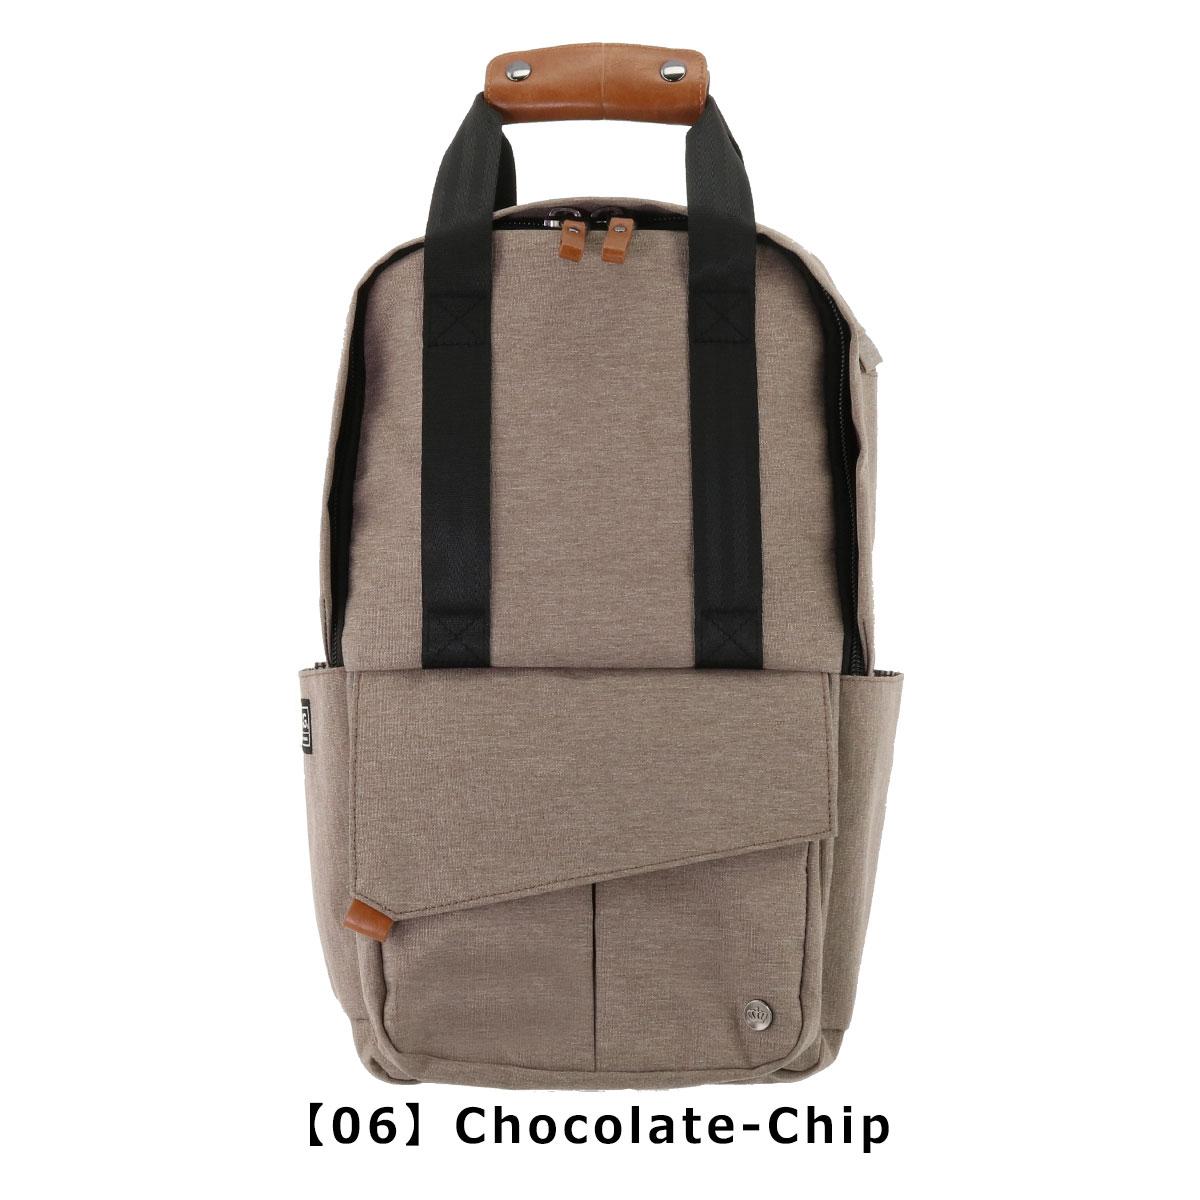 【06】Chocolate-Chip